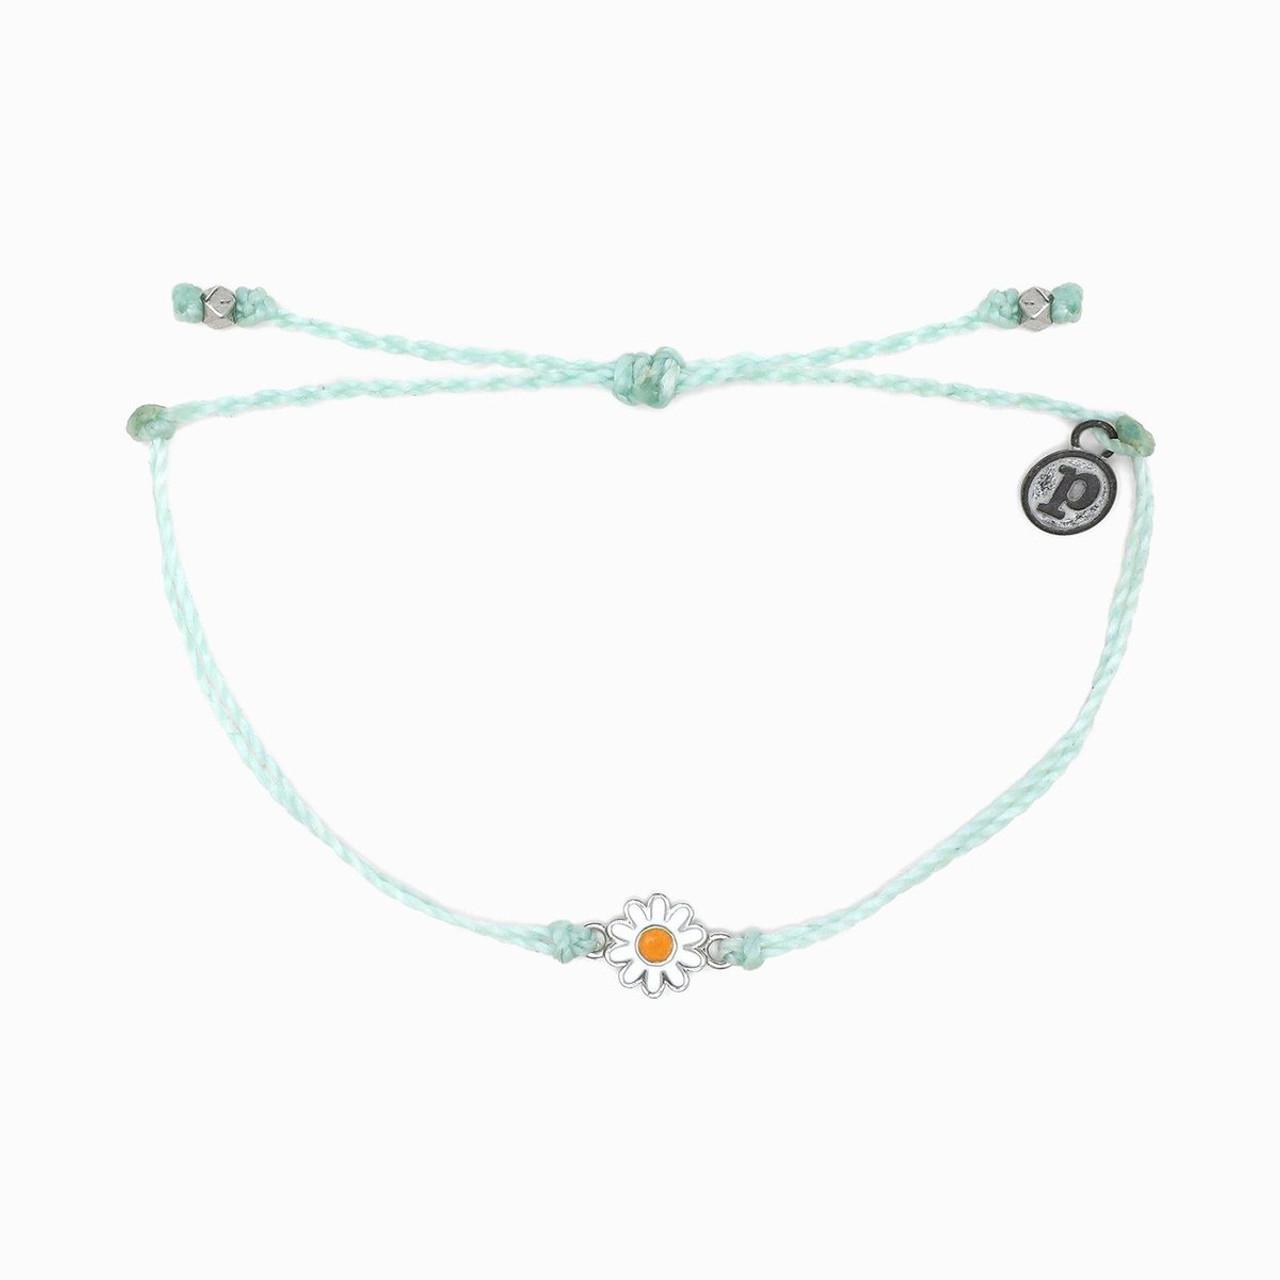 Silver Plated Charm Adjustable Band Pura Vida Mini Braided Beaded Bracelet